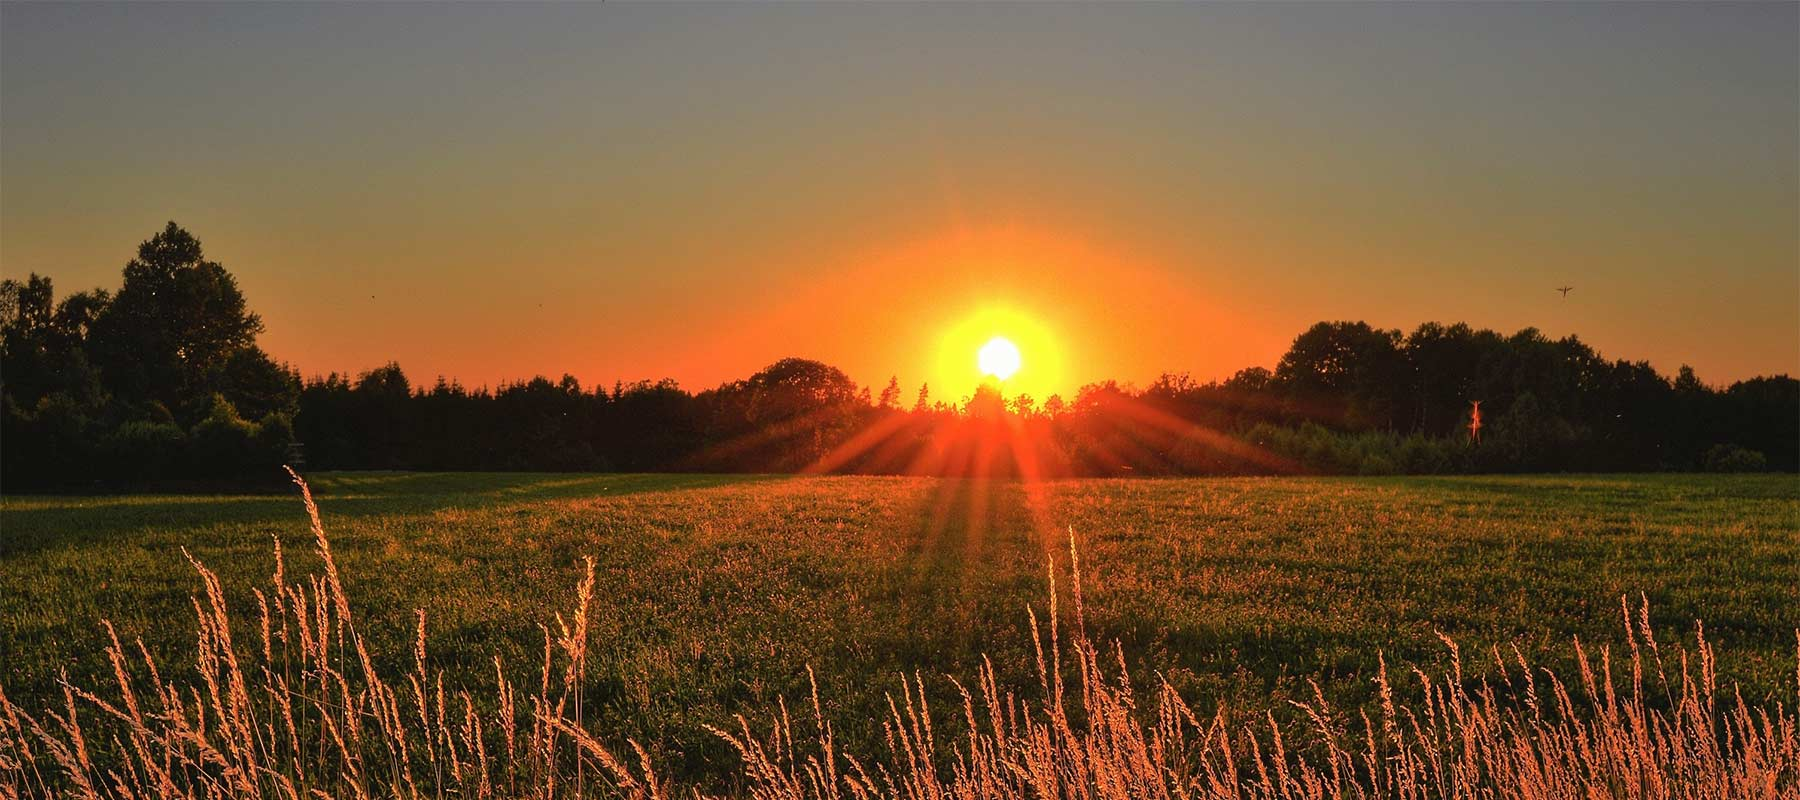 Sunrise over a meadow